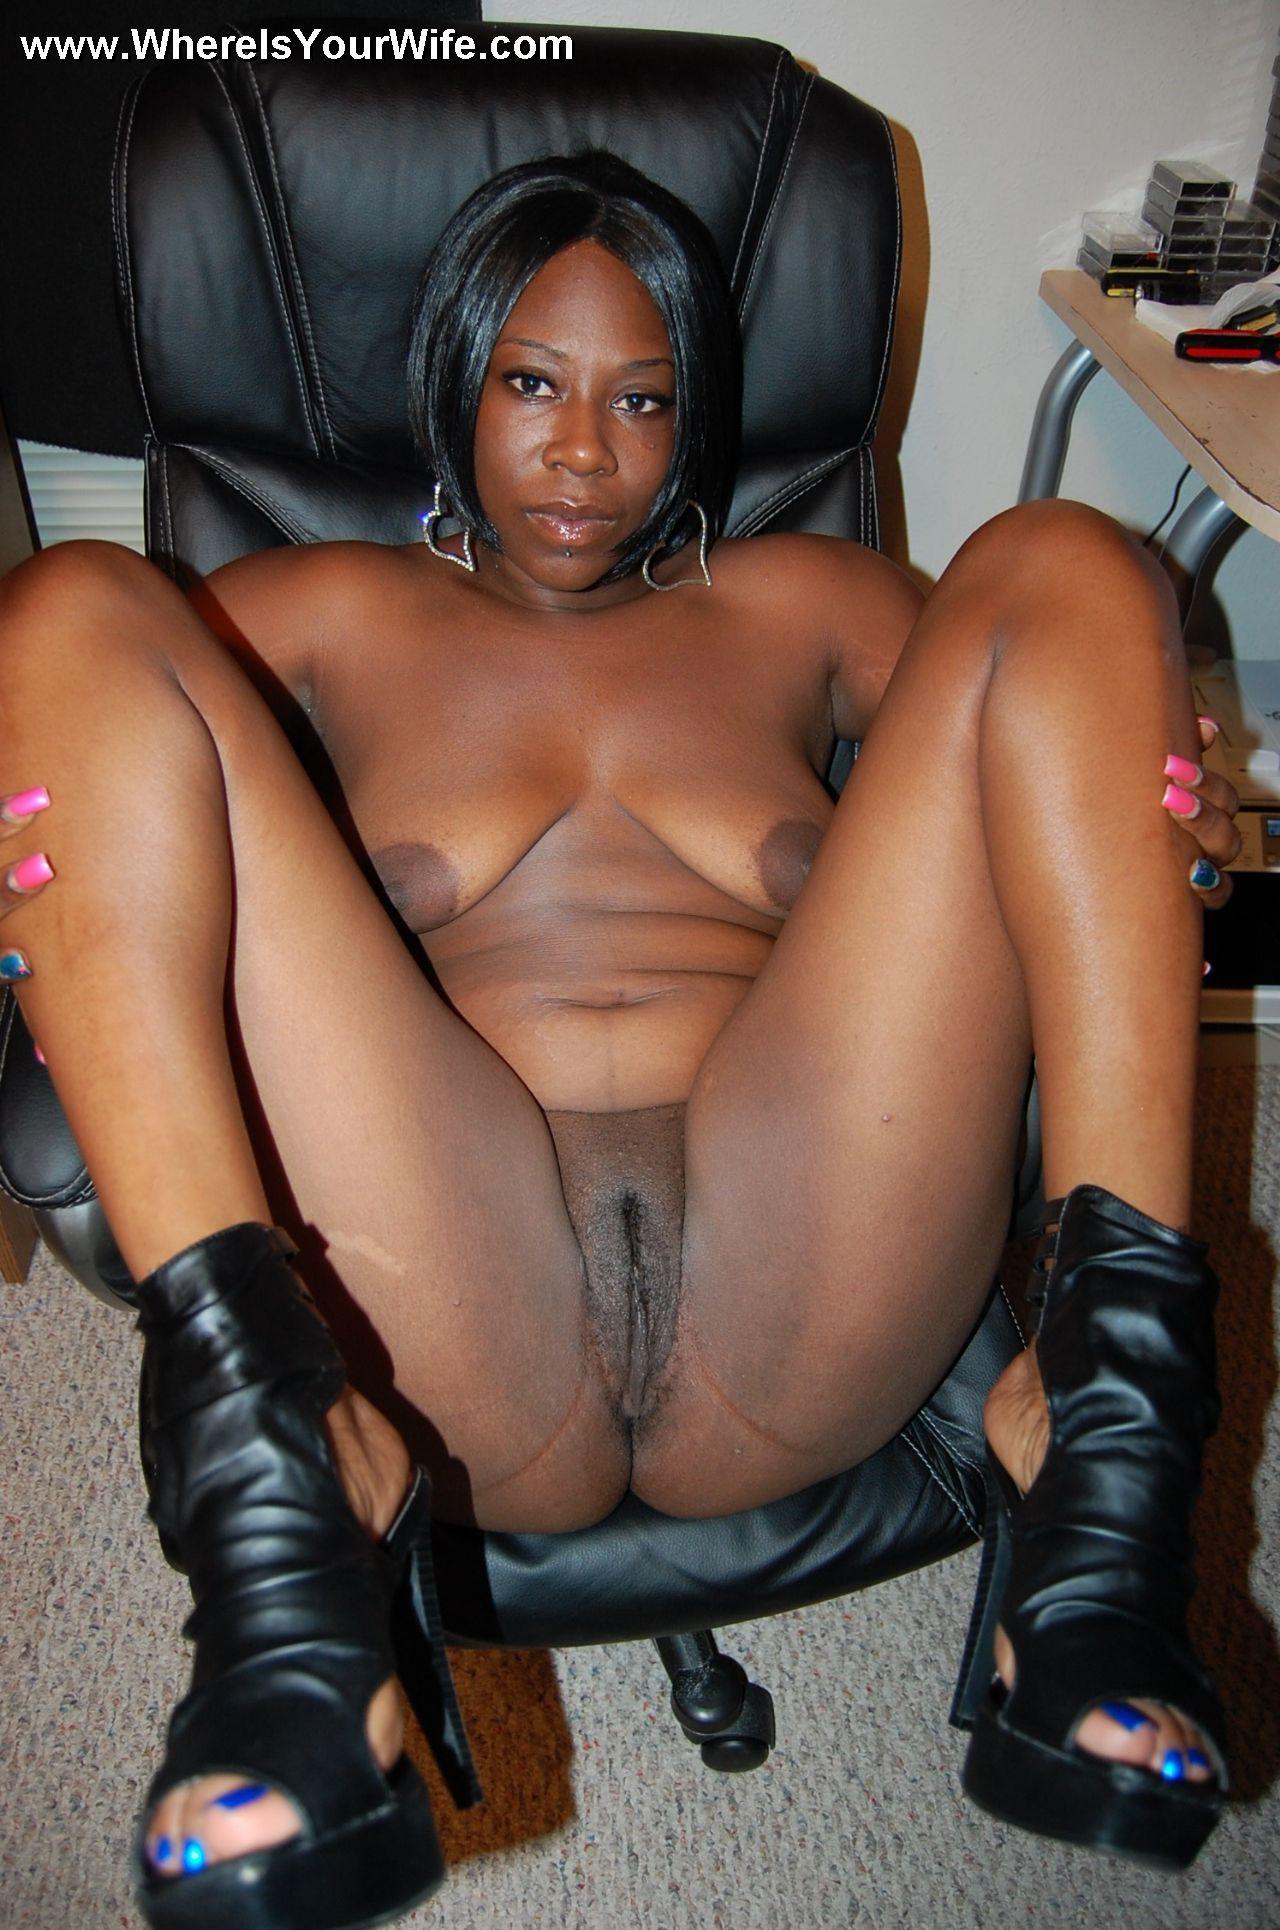 Old black women naked